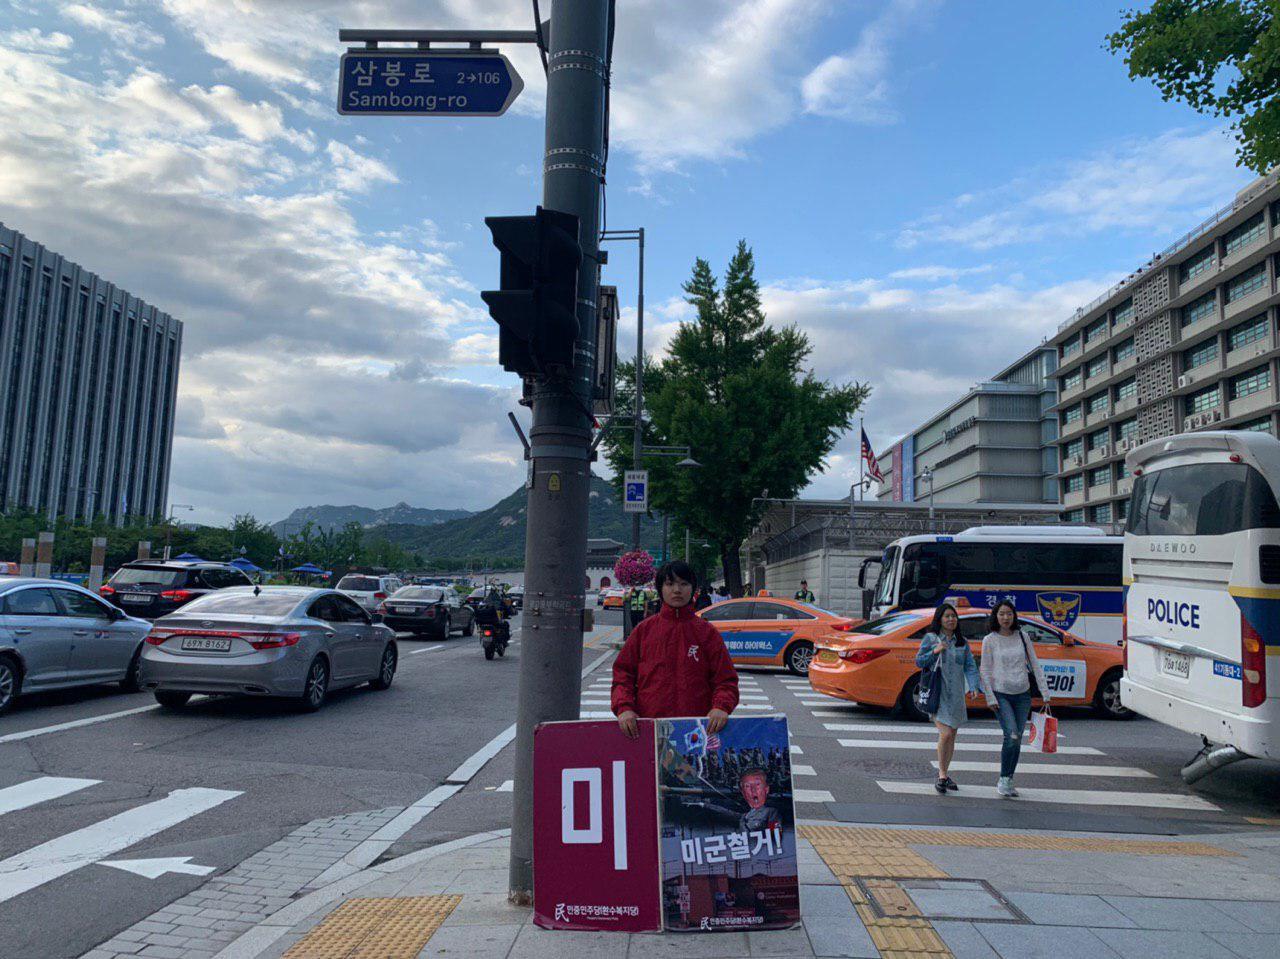 photo_2019-06-10_16-14-39.jpg